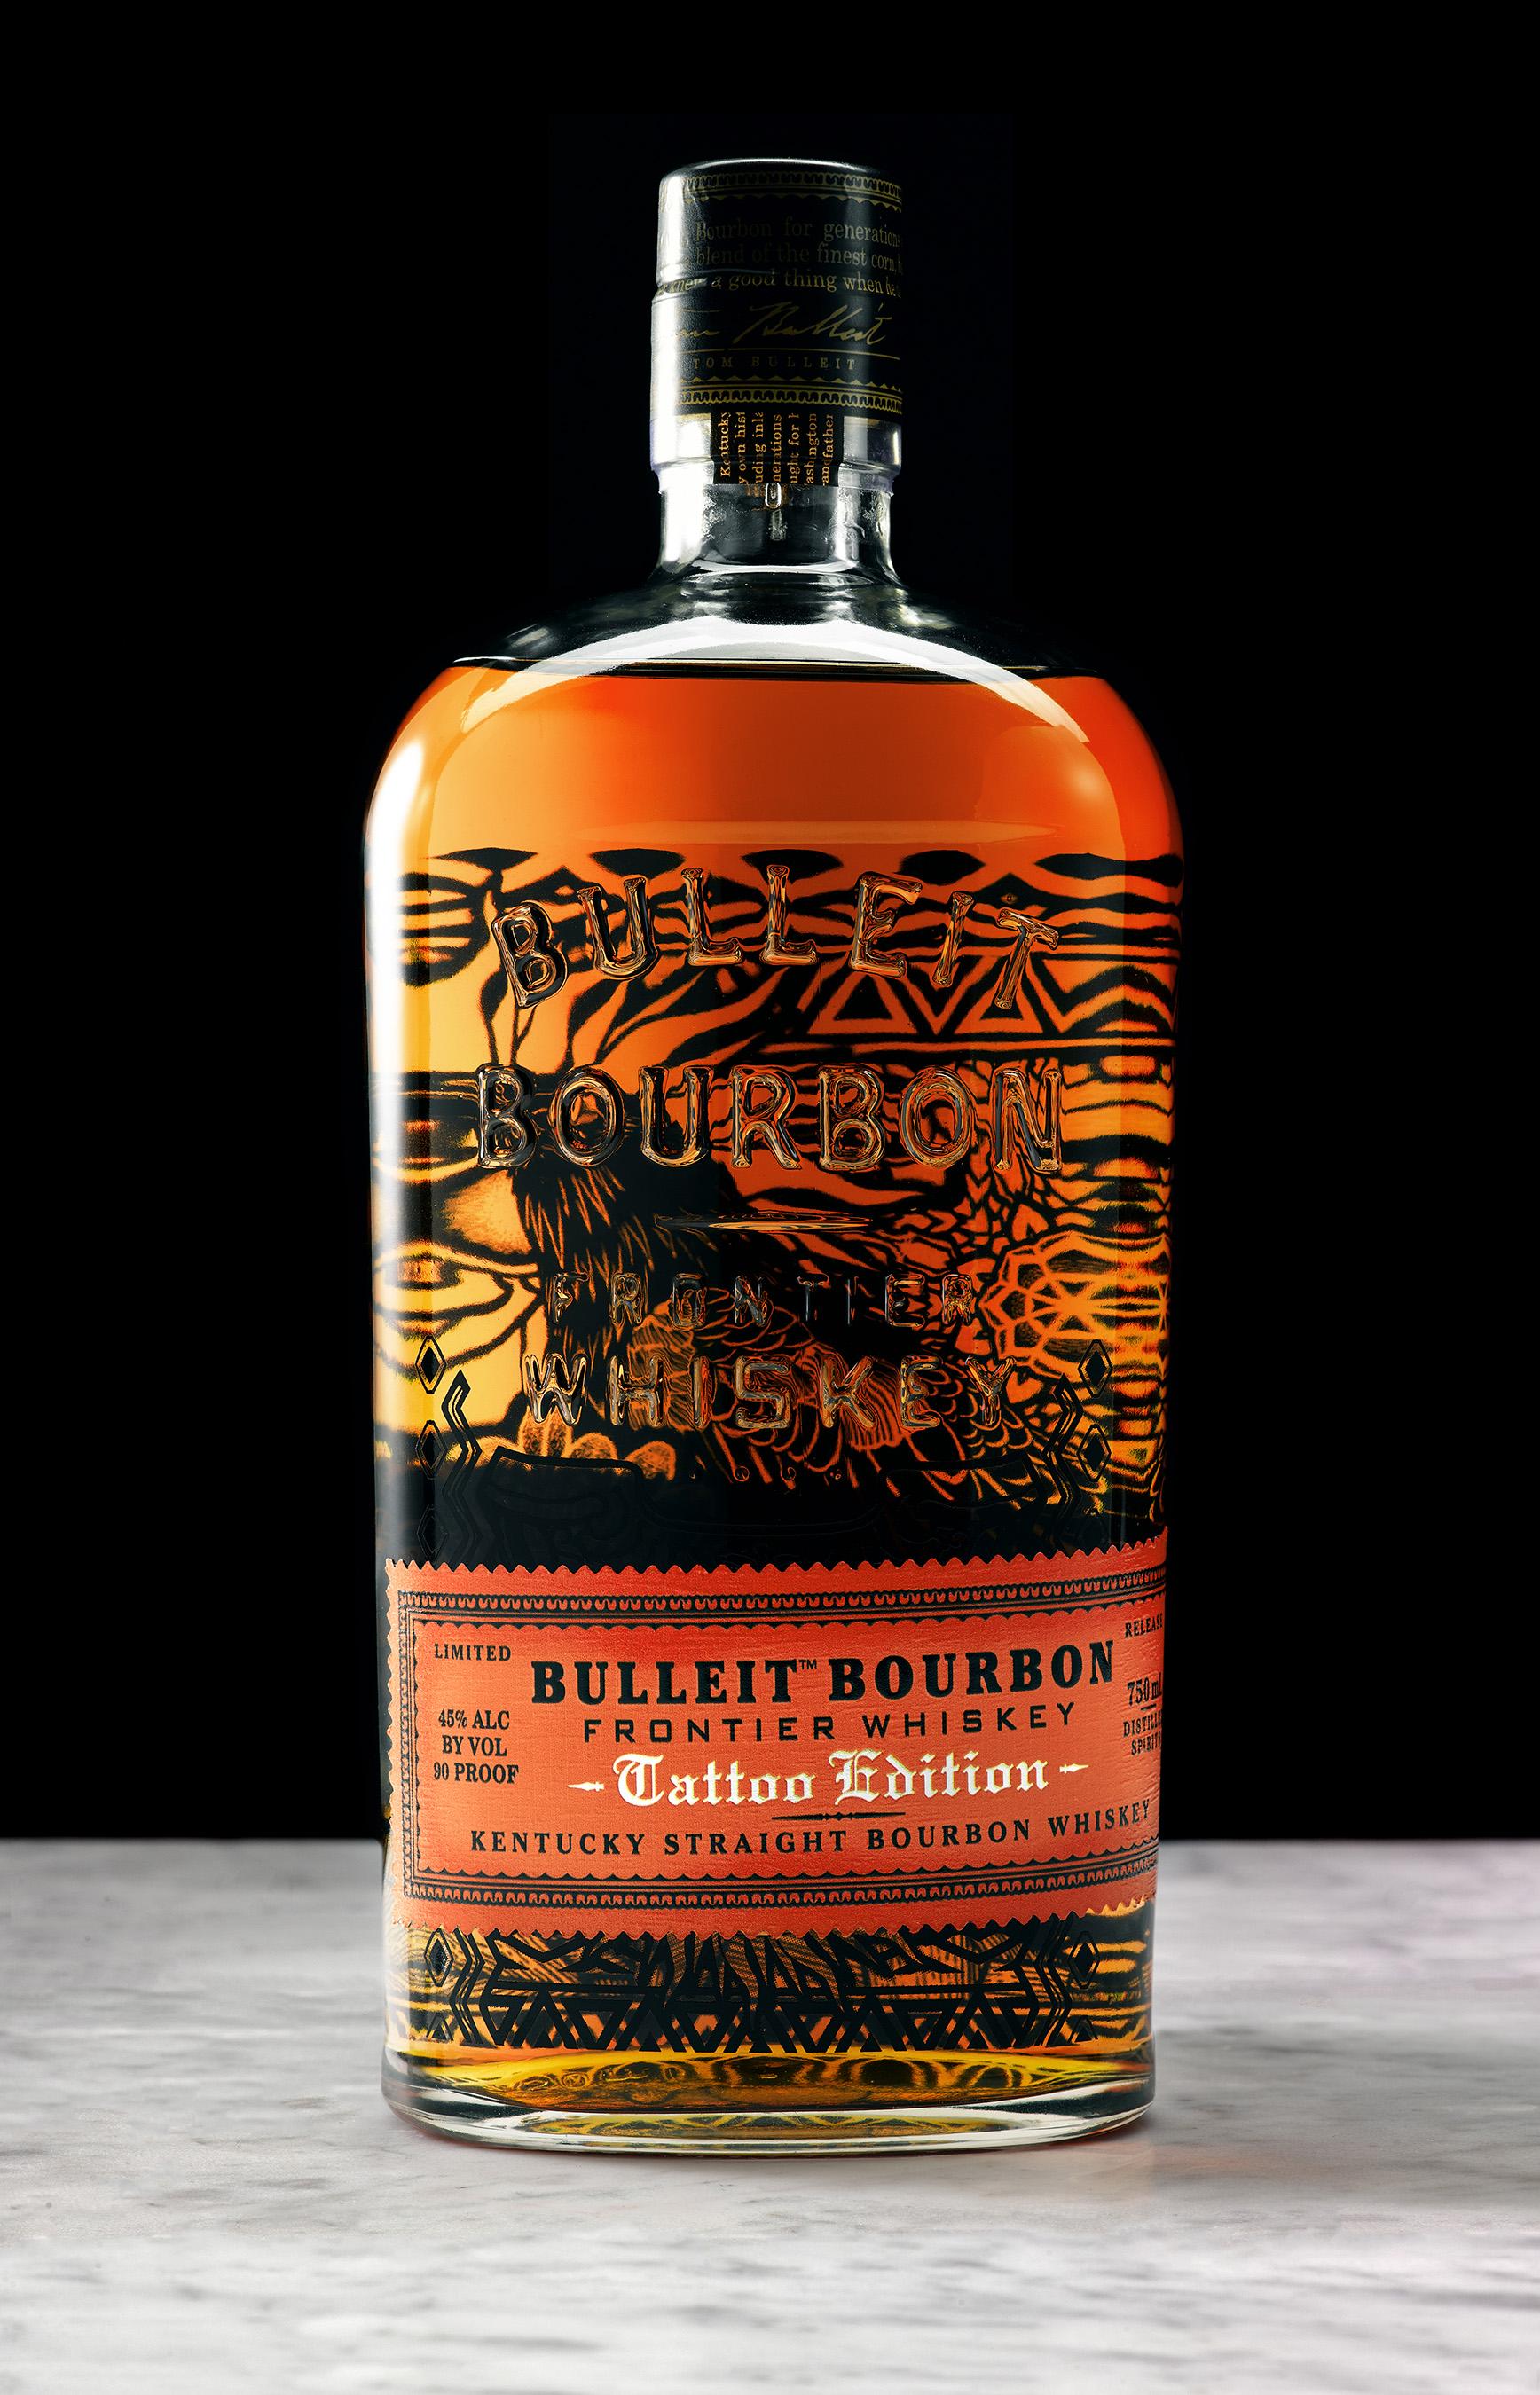 Bulleit Bourbon Tattoo Edition bottle designed by Austin tattoo artist Thomas Hooper